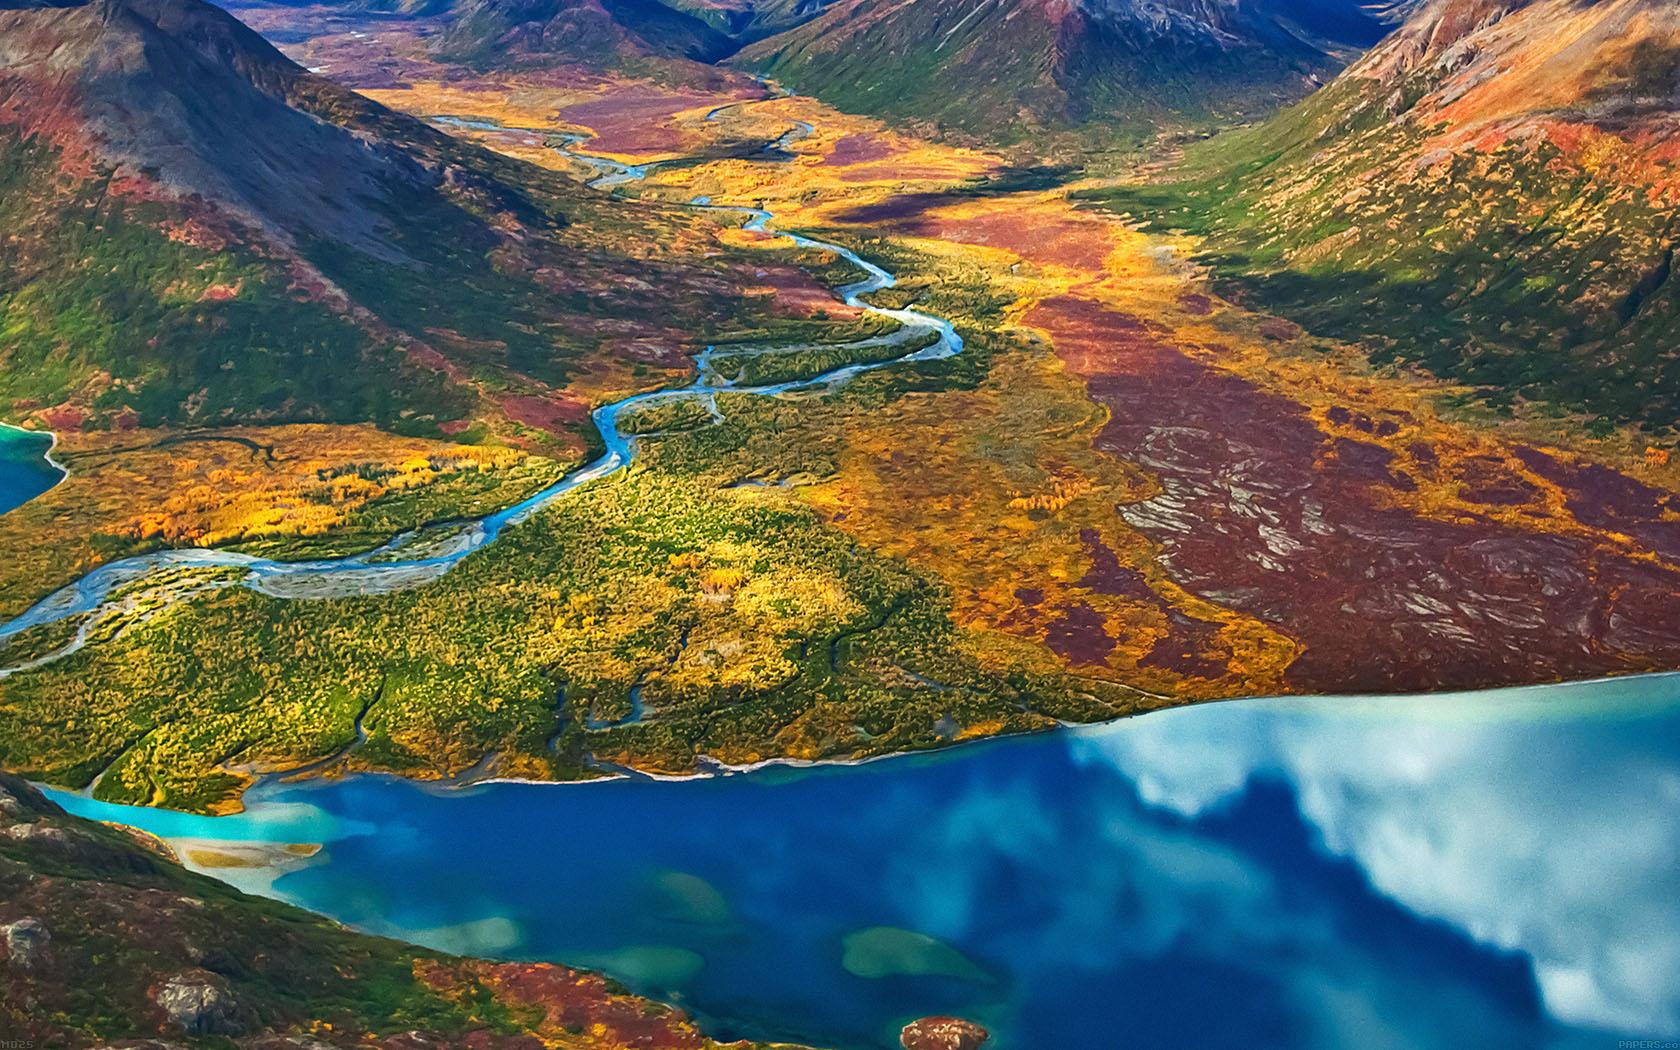 Md25-wallpaper-land-rainbow-mountain-field-nature